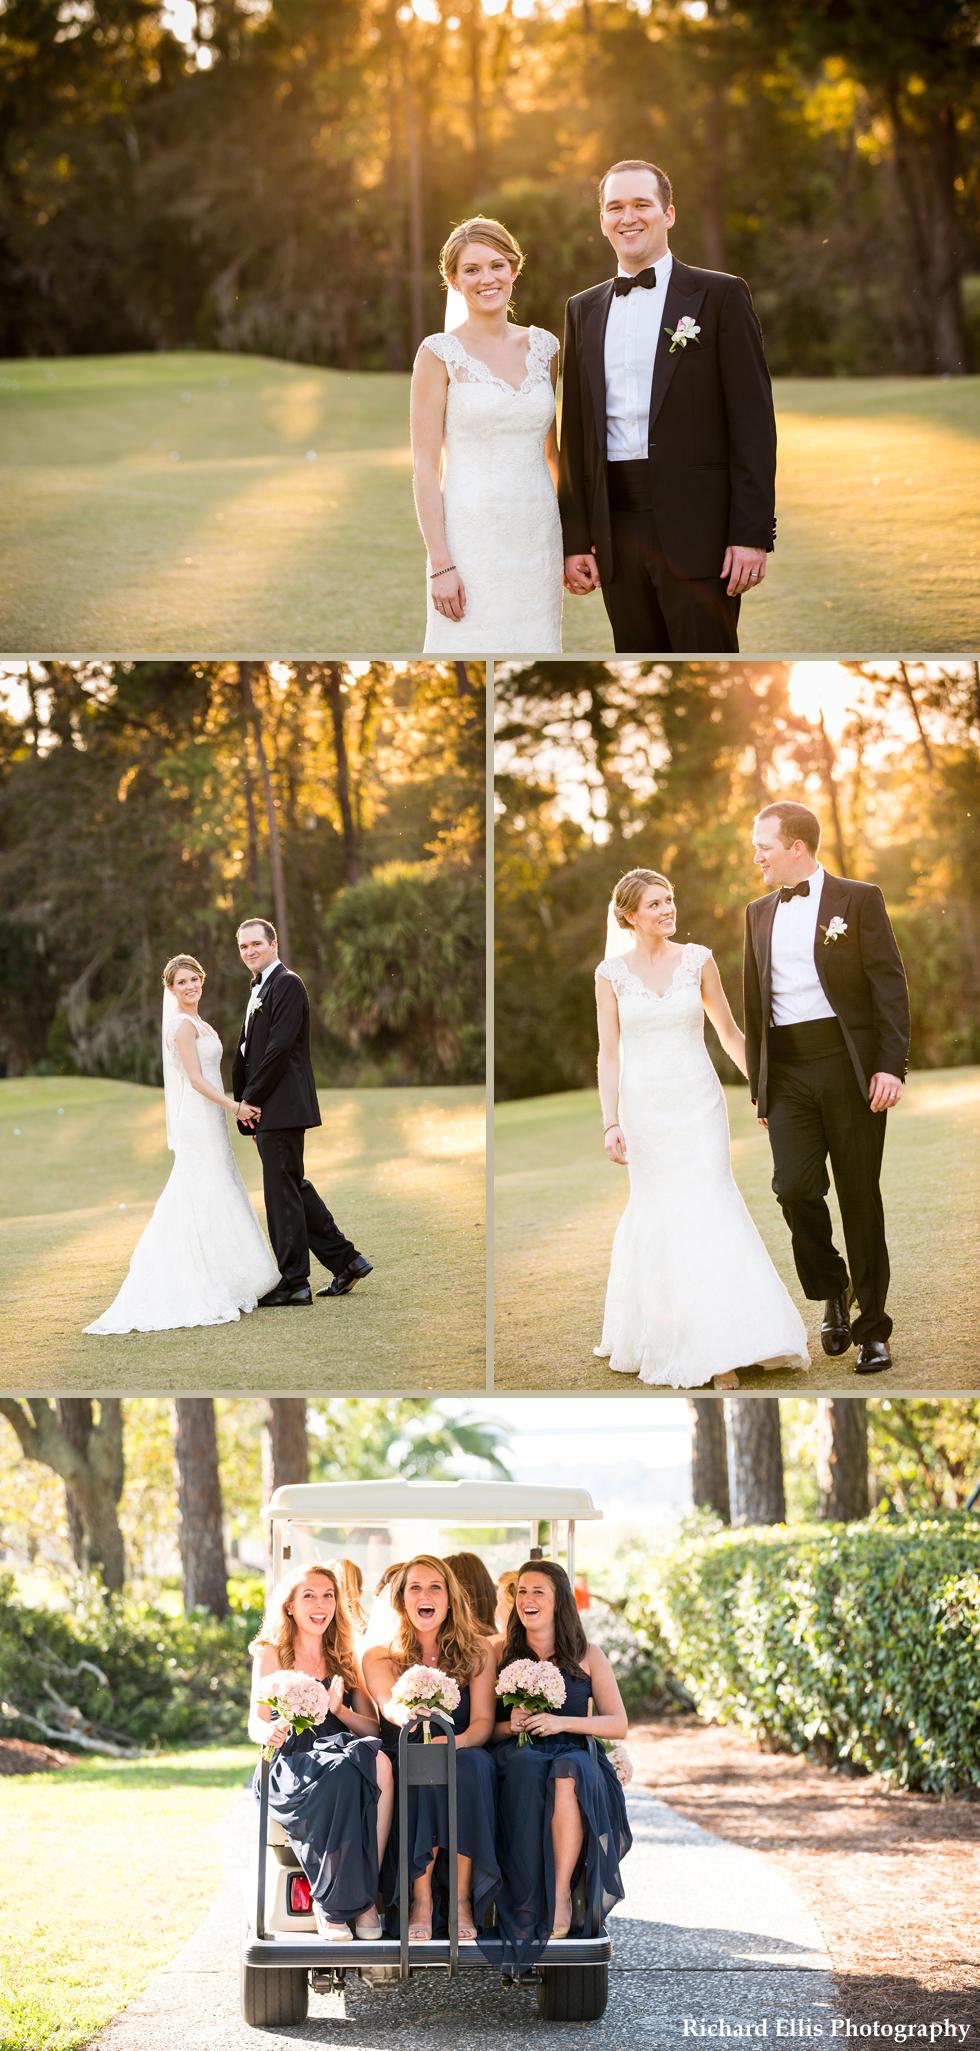 Sneak peek of Jennifer and David's wedding photographed by Charleston wedding photographer Richard Ellis Photography